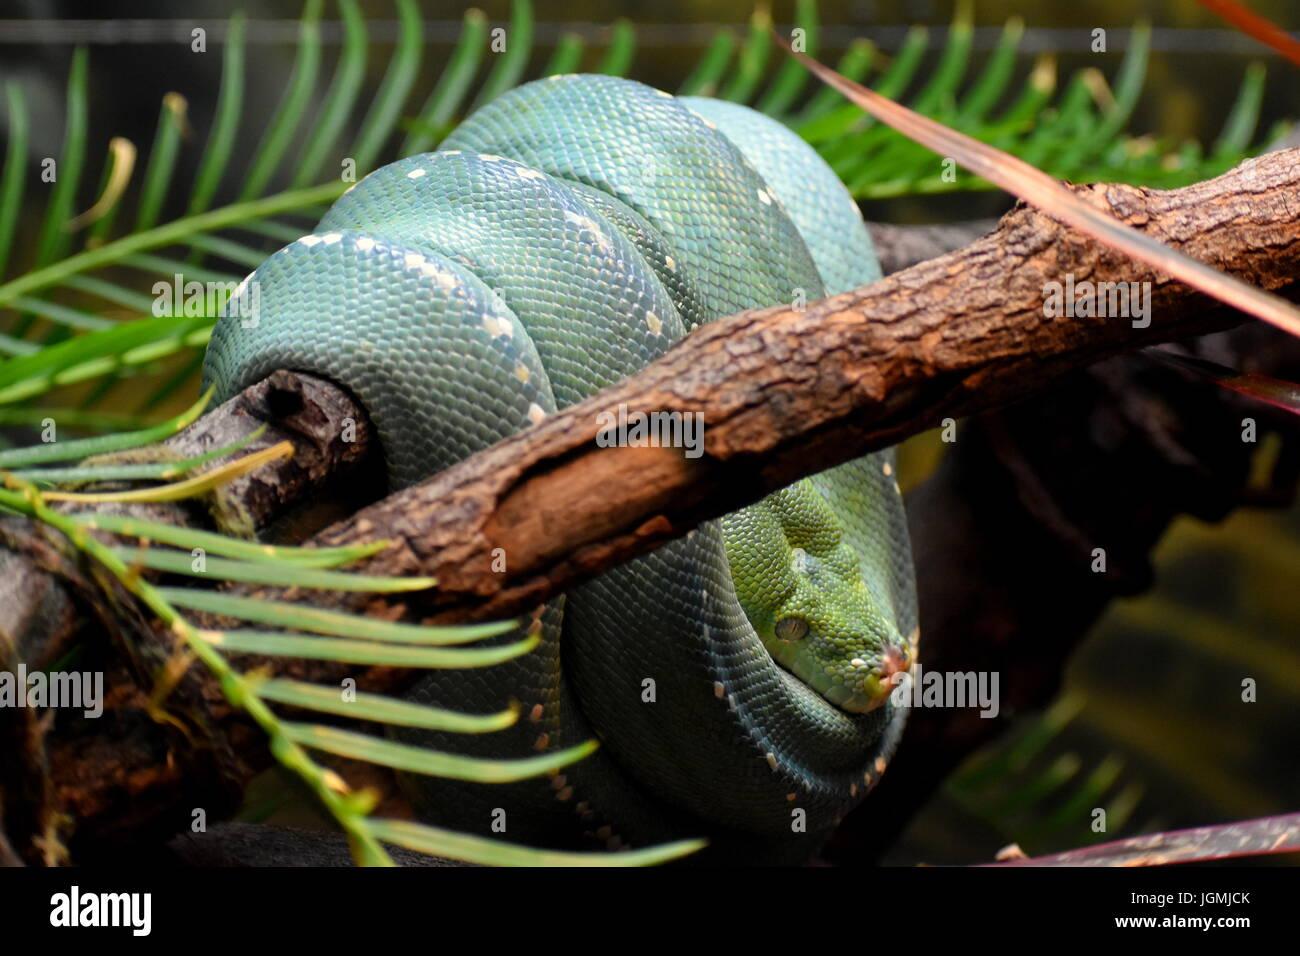 Espiral Serpiente verde en una sucursal Imagen De Stock